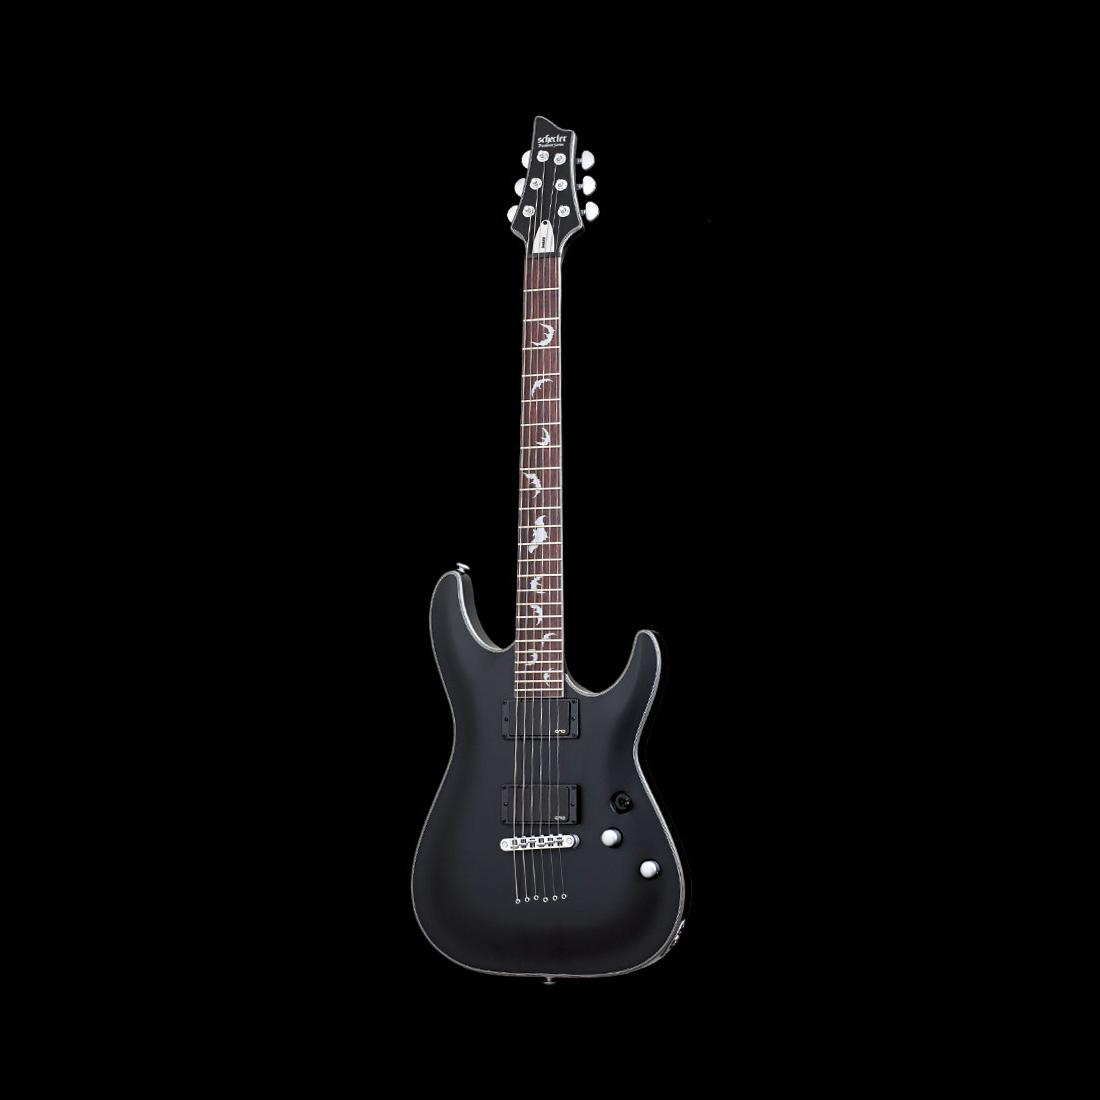 Schecter / DAMIEN PLATINUM-6 Satin Black シェクター エレキギター 【お取り寄せ商品】